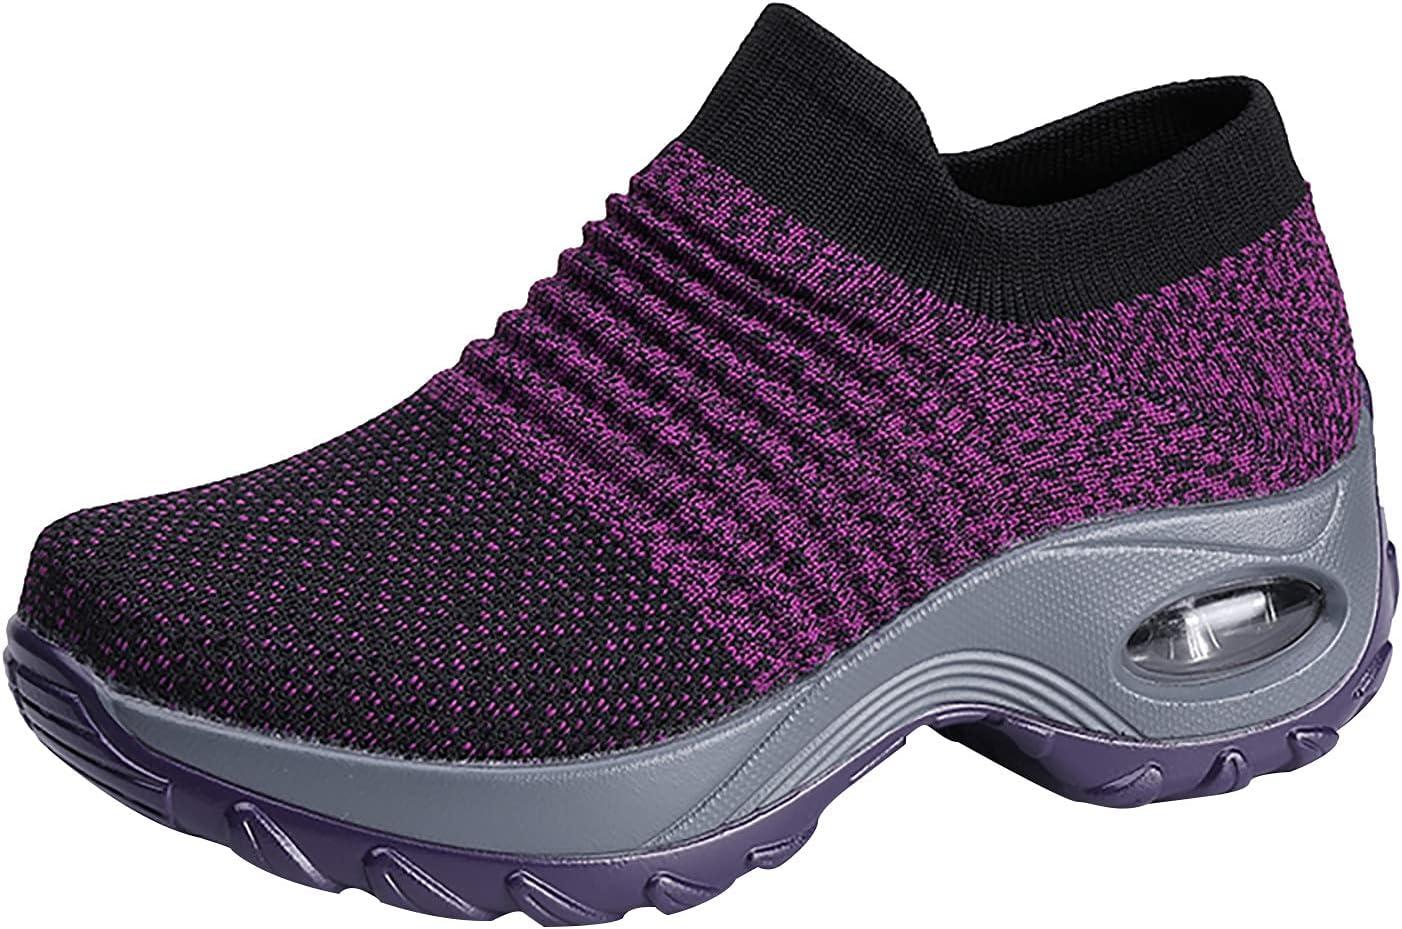 FlekmanArt Womens Super intense SALE Fashion Mesh Classic Sock Outdoo Platform Casual Shoes